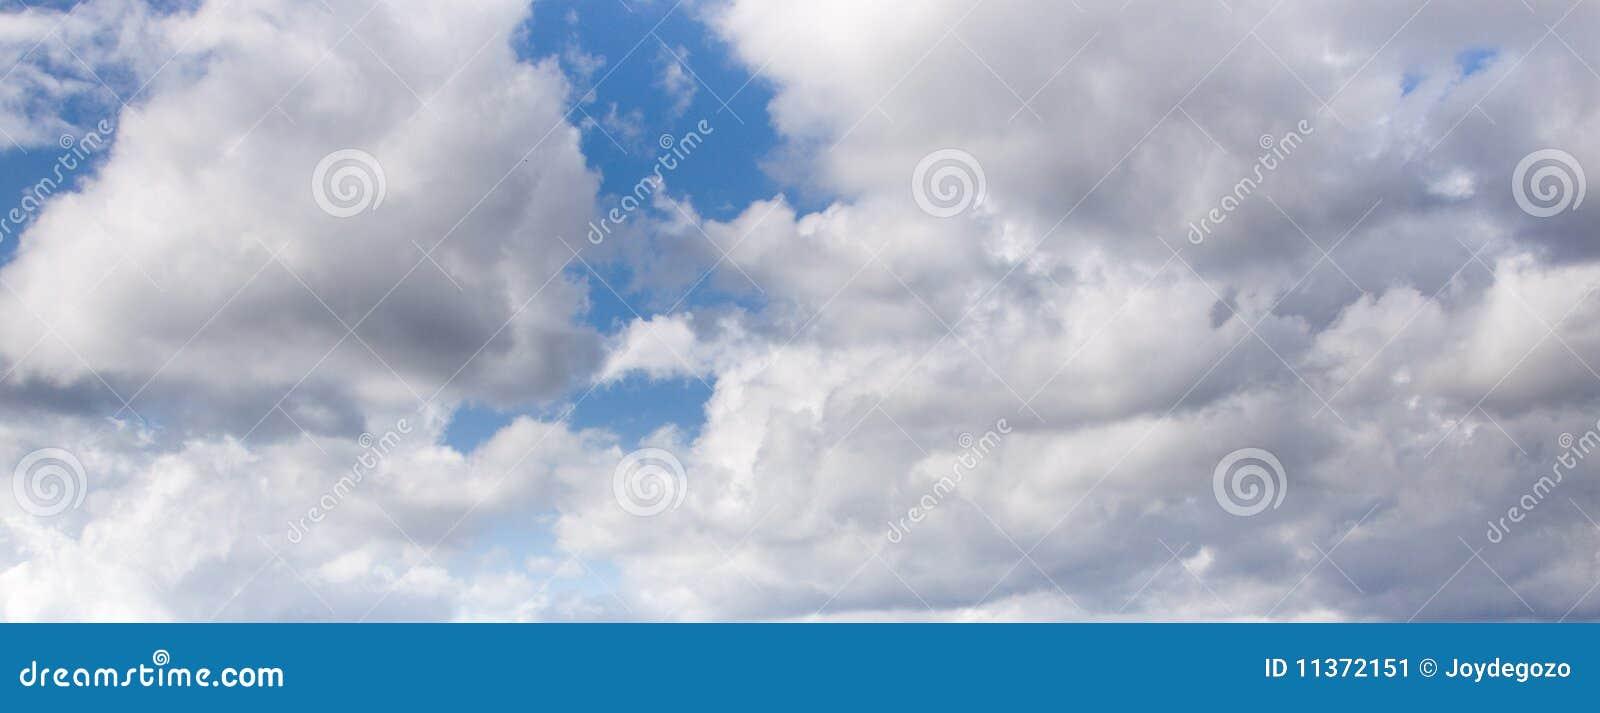 Cloudy Sky Panorama Stock Image - Image: 11372151